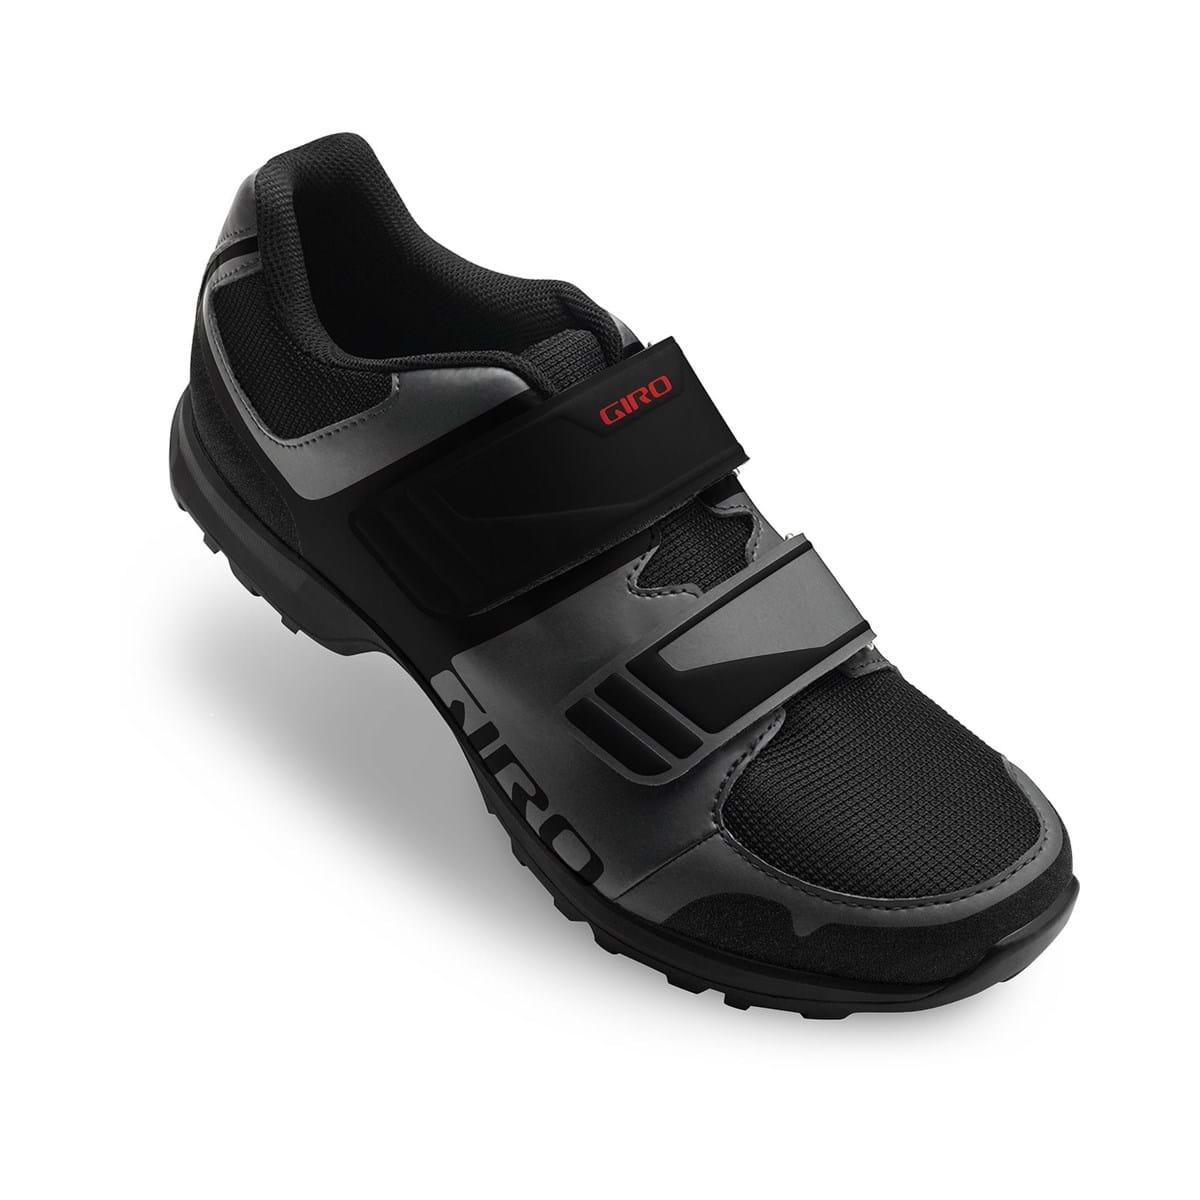 Berm Cover MTB Cycling Shoes